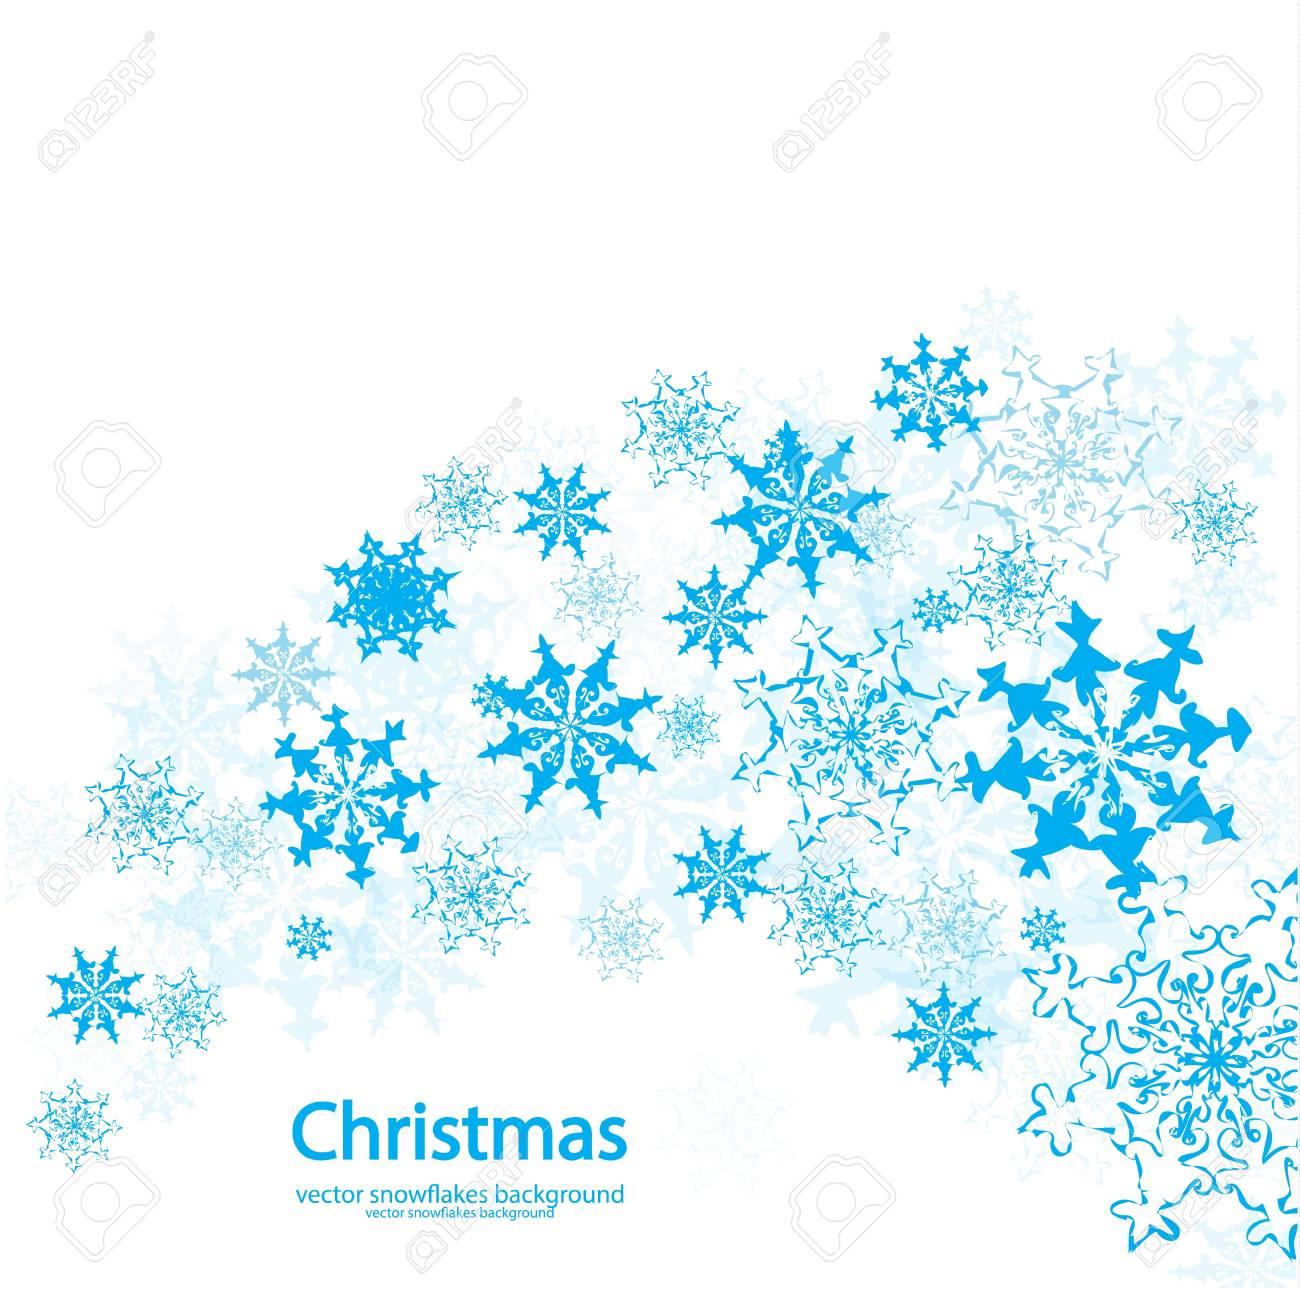 Christmas Snowflakes.Vector Christmas Snowflakes Background